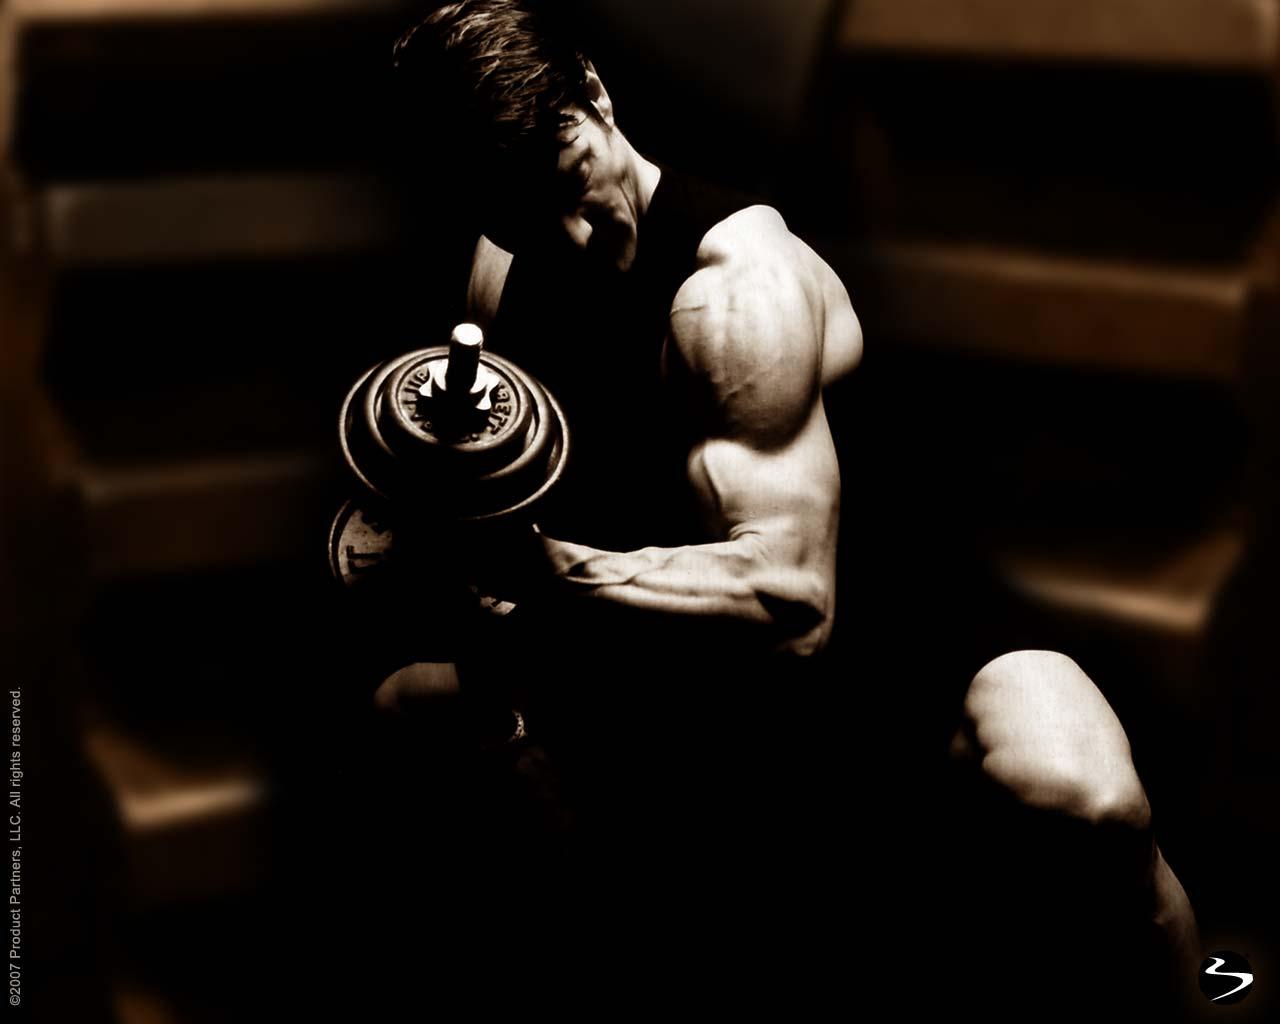 46 Gym Motivation Wallpaper On Wallpapersafari